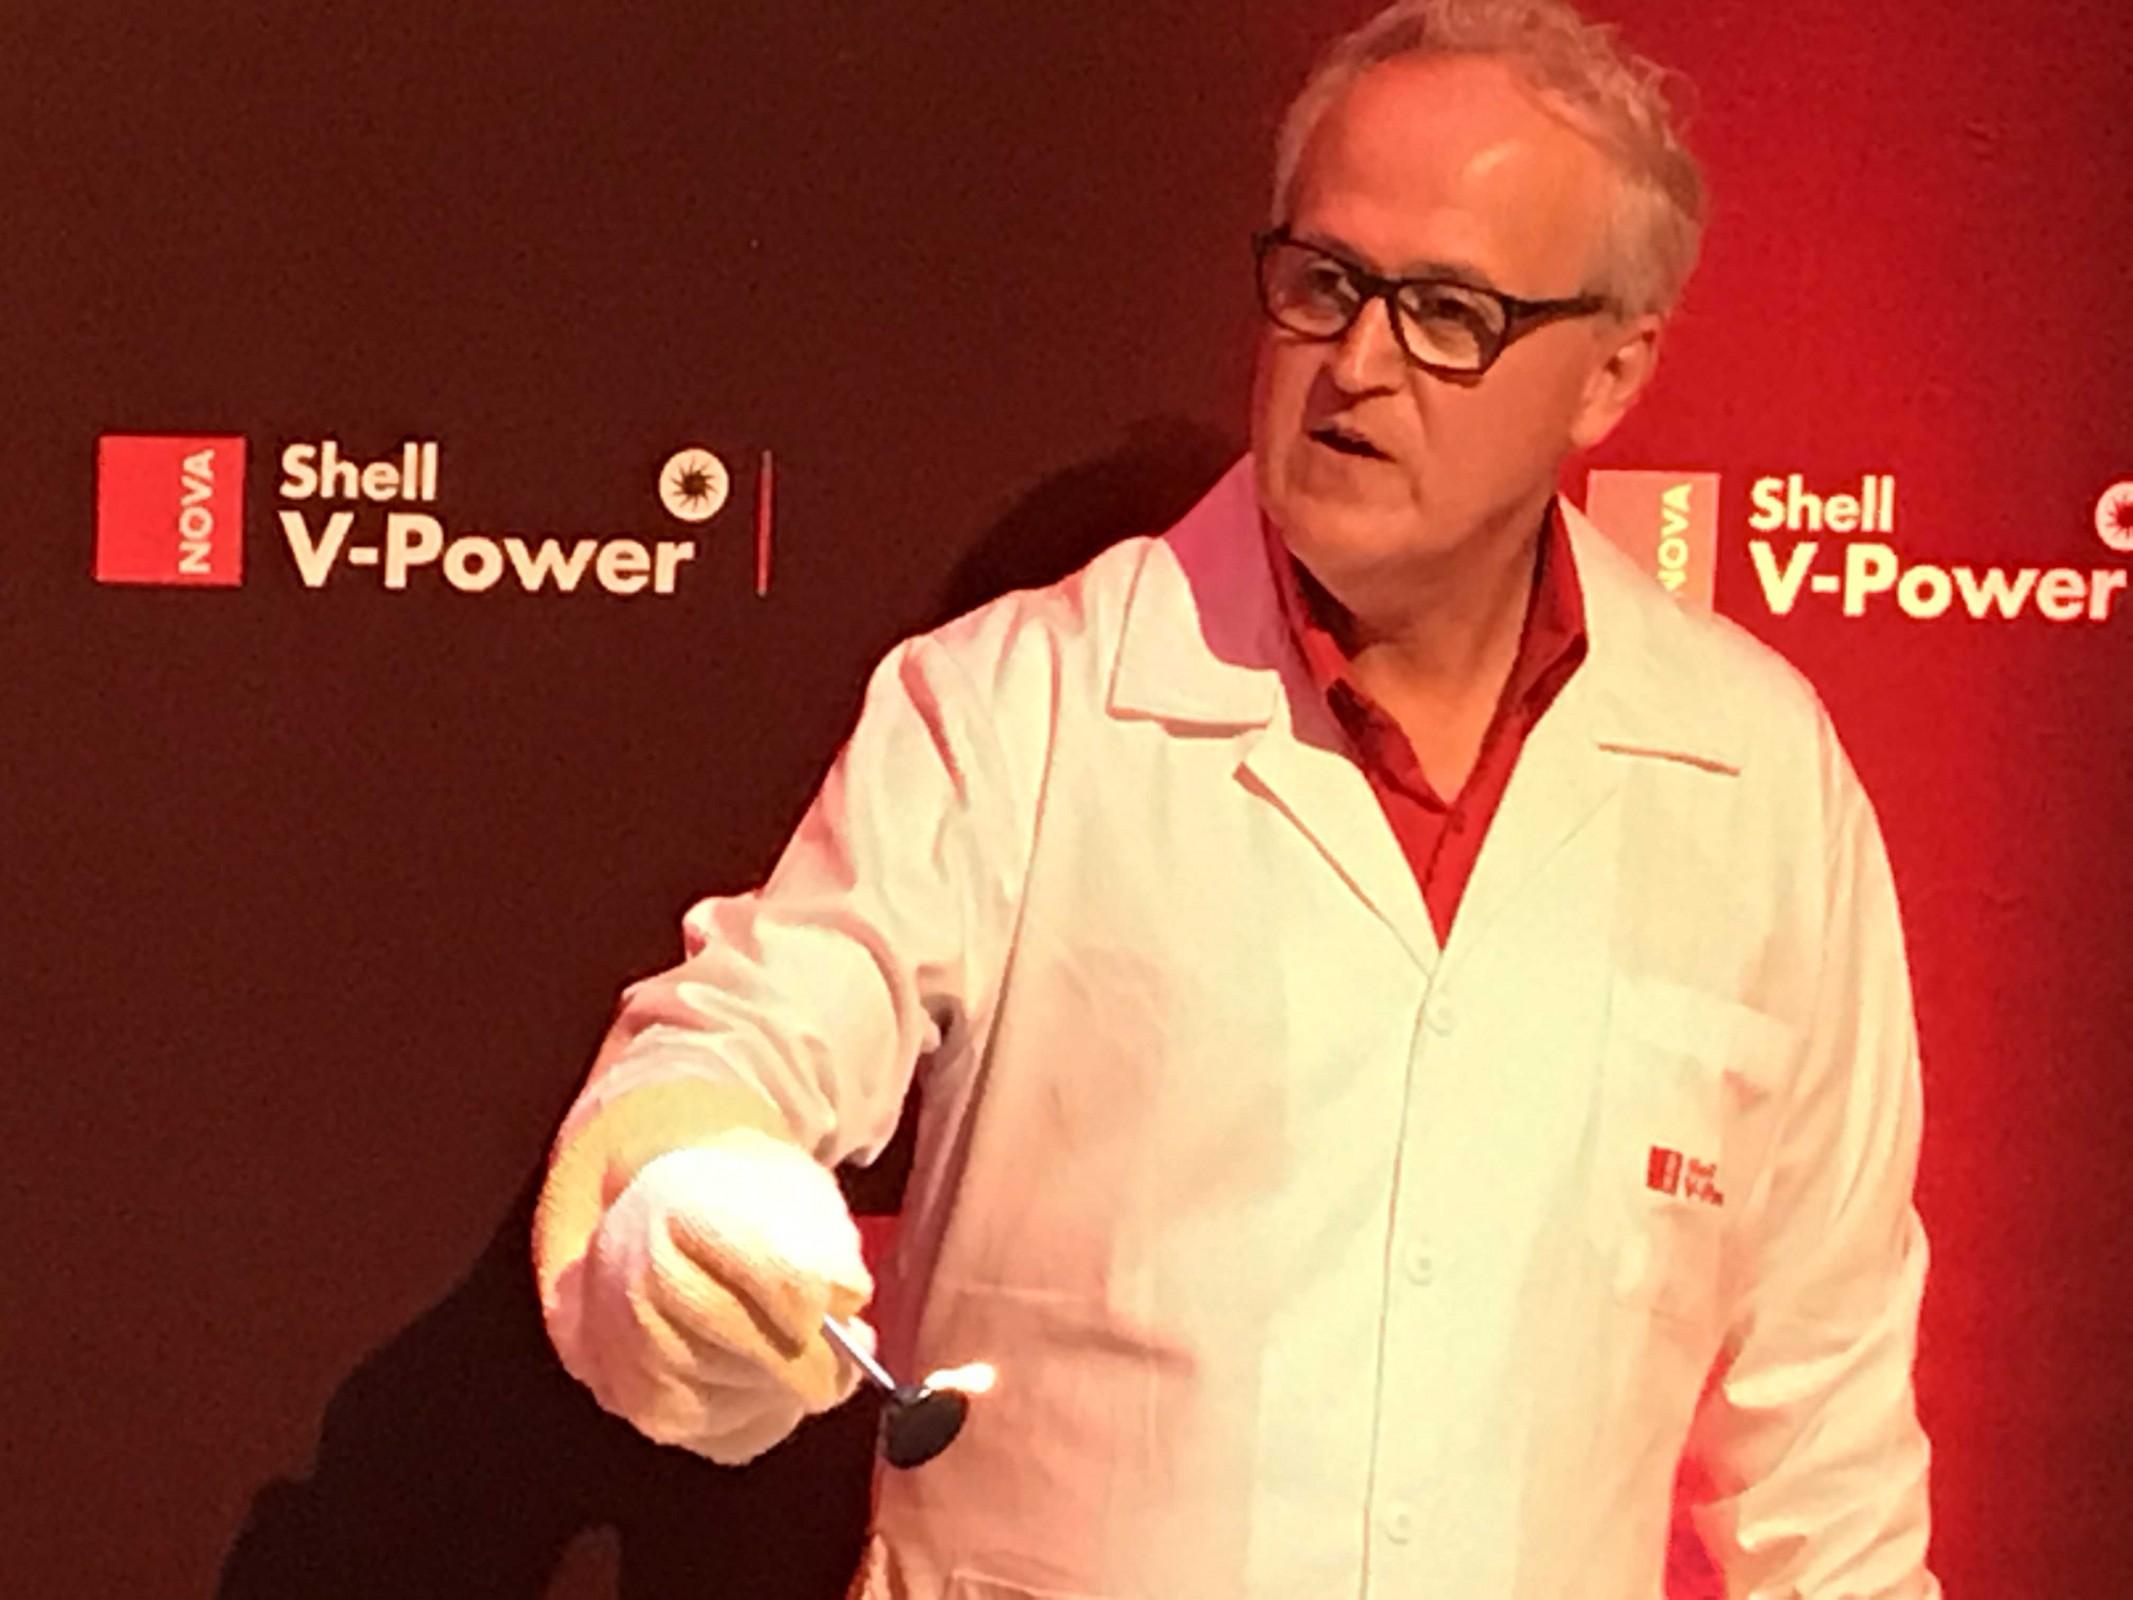 nova gasolina aditivada shell v-power raizen Gilberto Pose